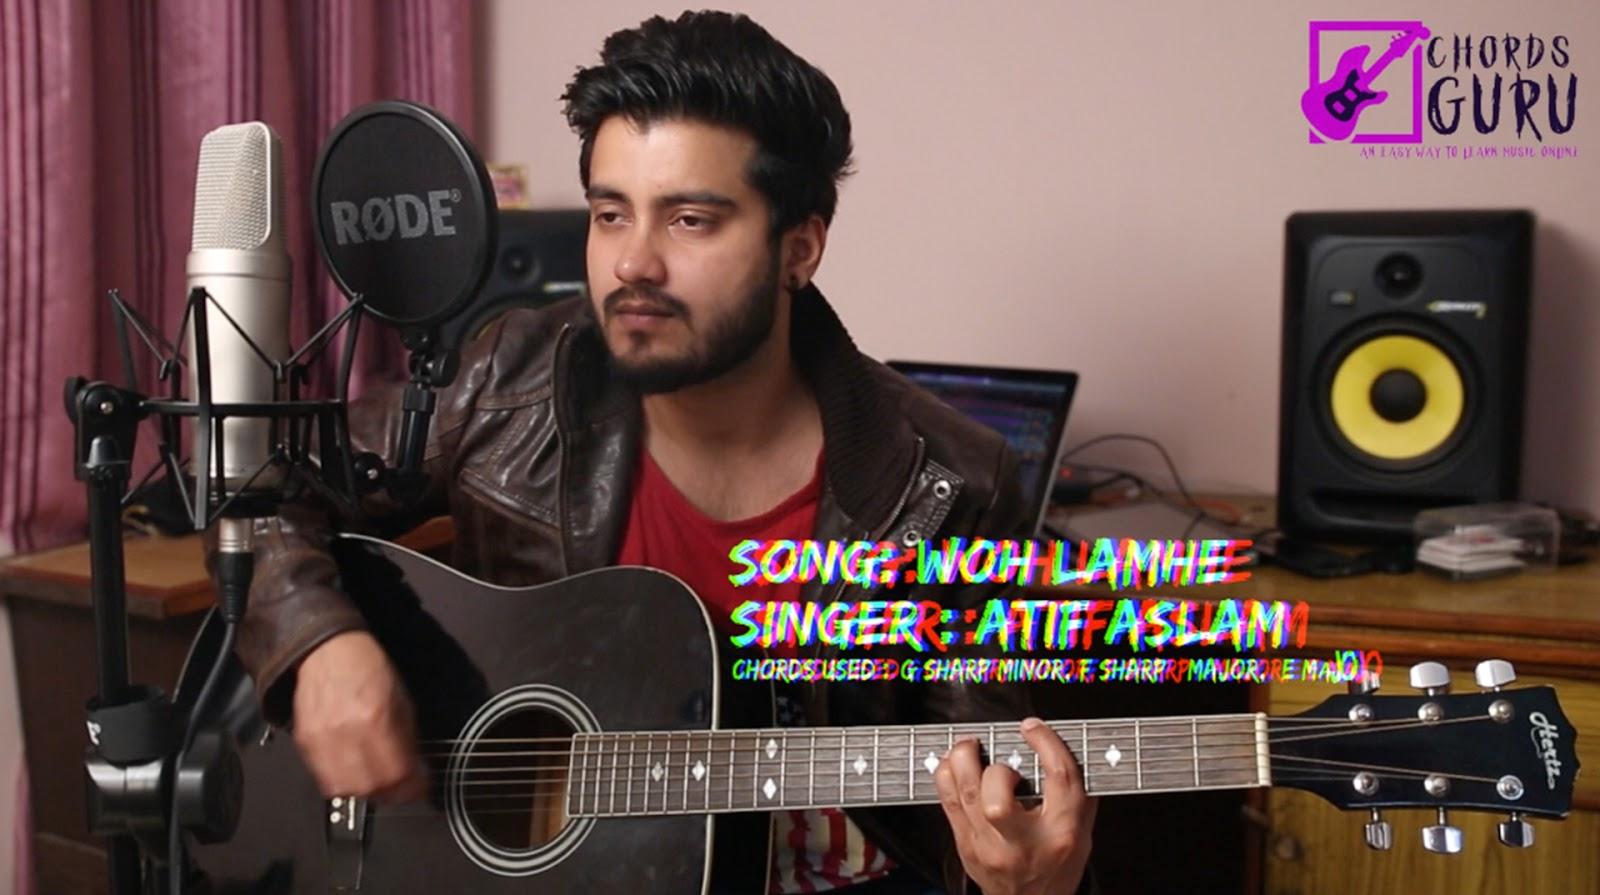 Woh Lamhe Jal The Band Atif Aslam Chords Strumming Pattern